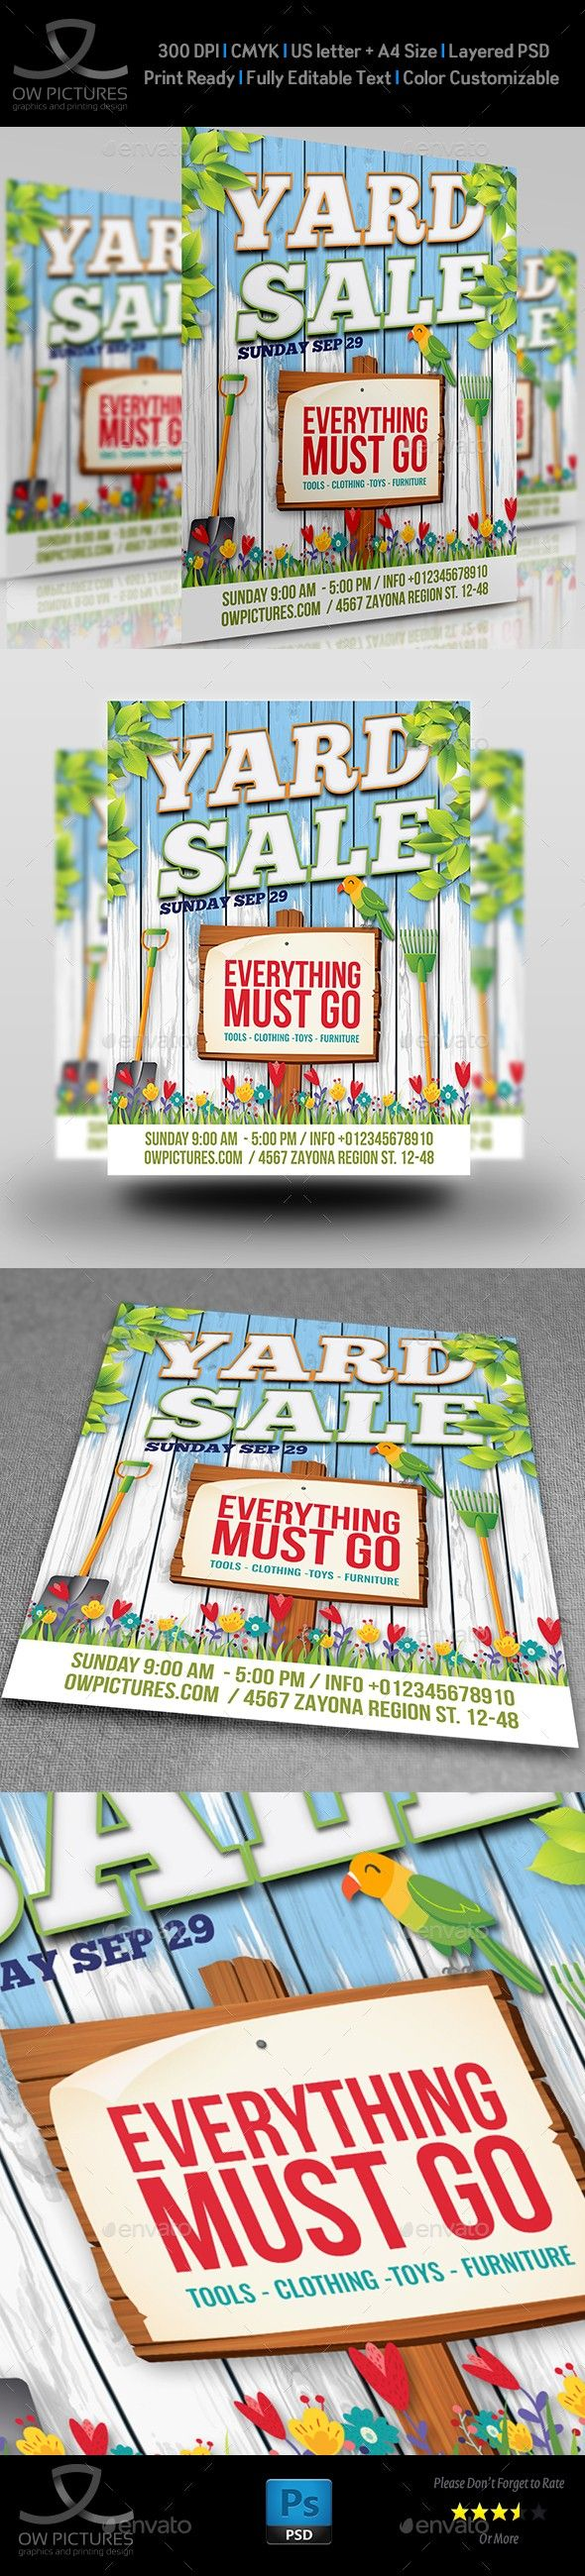 ad advert big clothing cover driveway flyer garage garage sale items junk leaflet moving neighborhood sale sales sp flyers templates